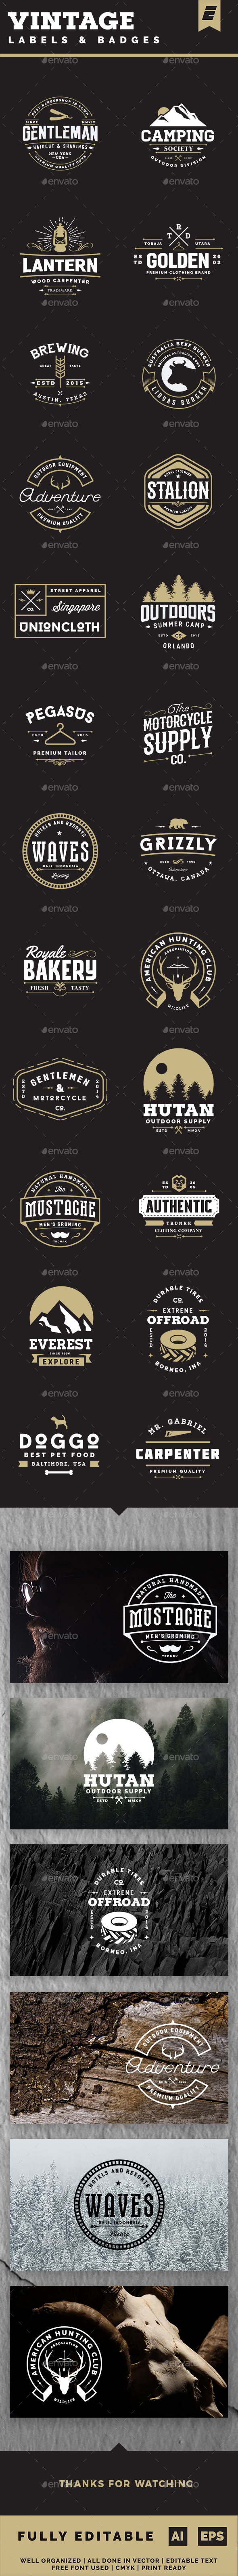 Vintage Label and Badges - Badges & Stickers Web Elements